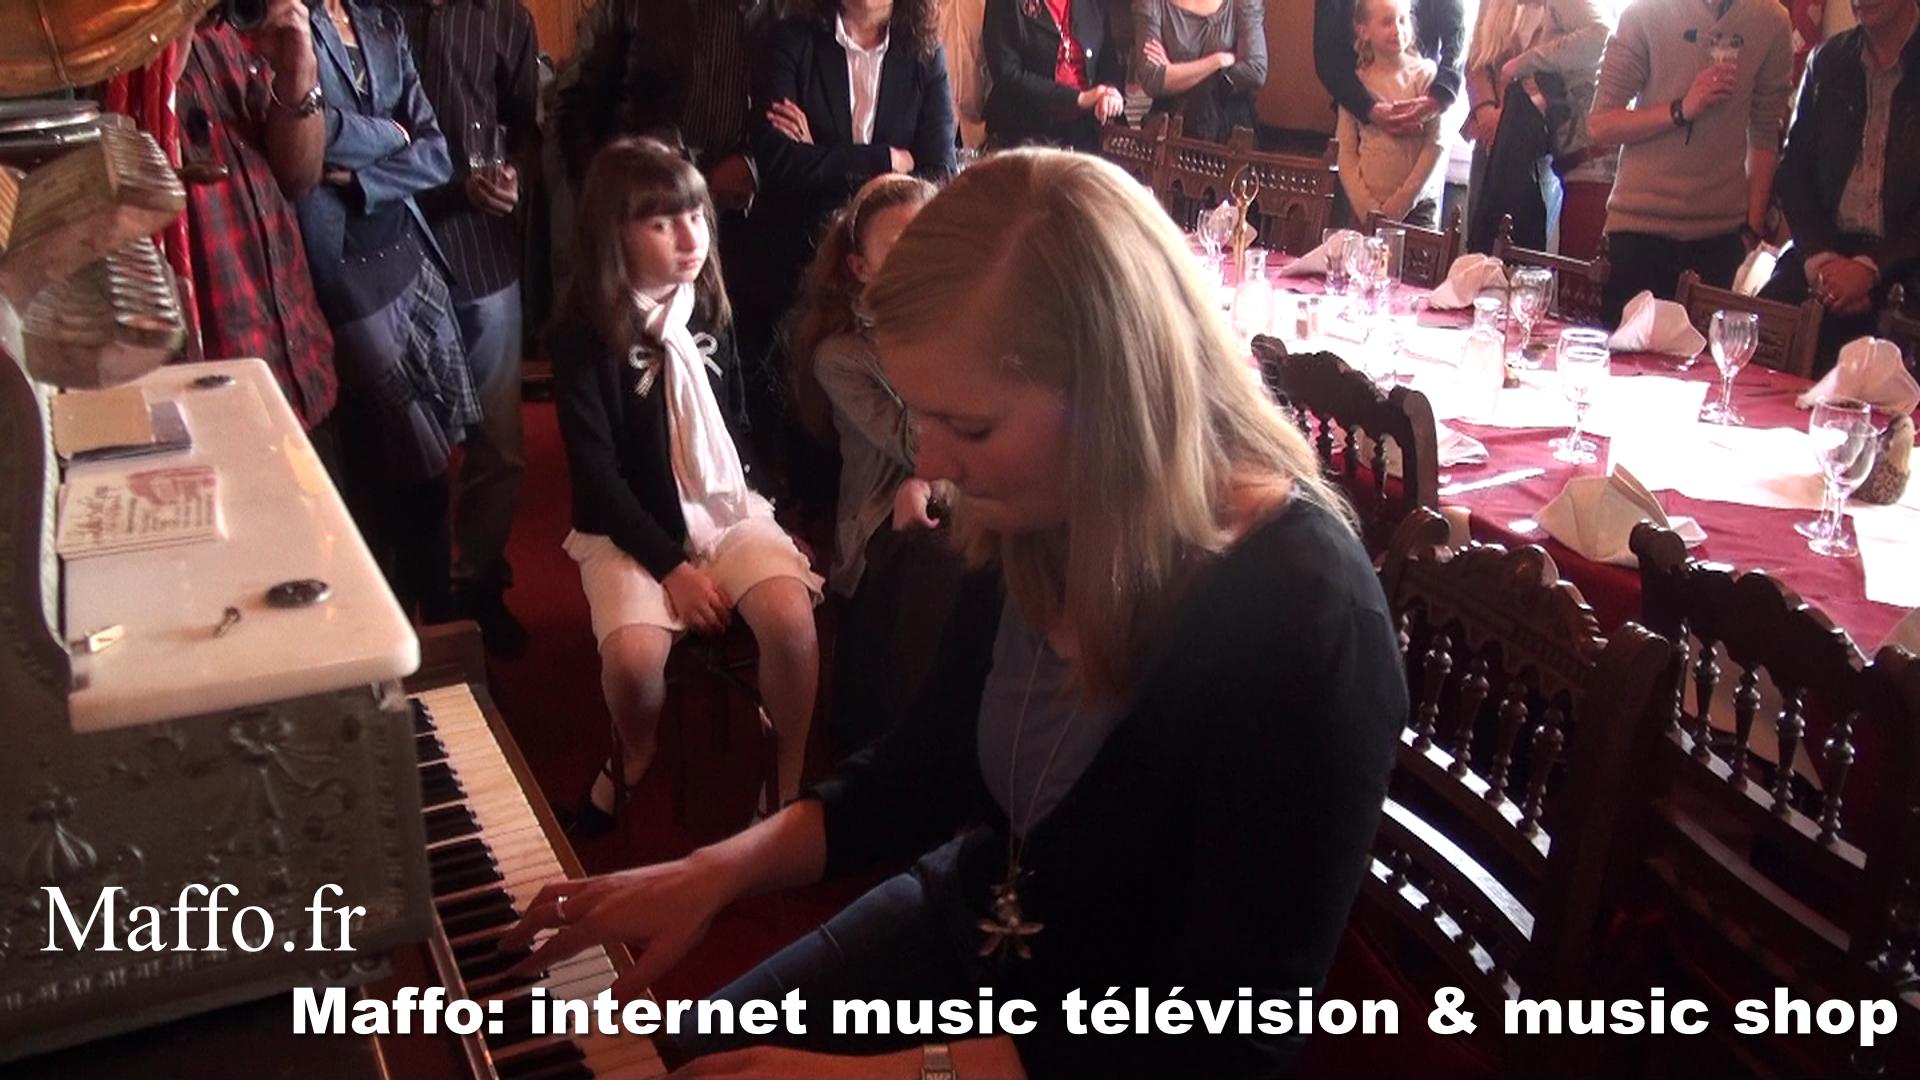 Solo Piano Concert Nadine, N°124, By Maffo.fr